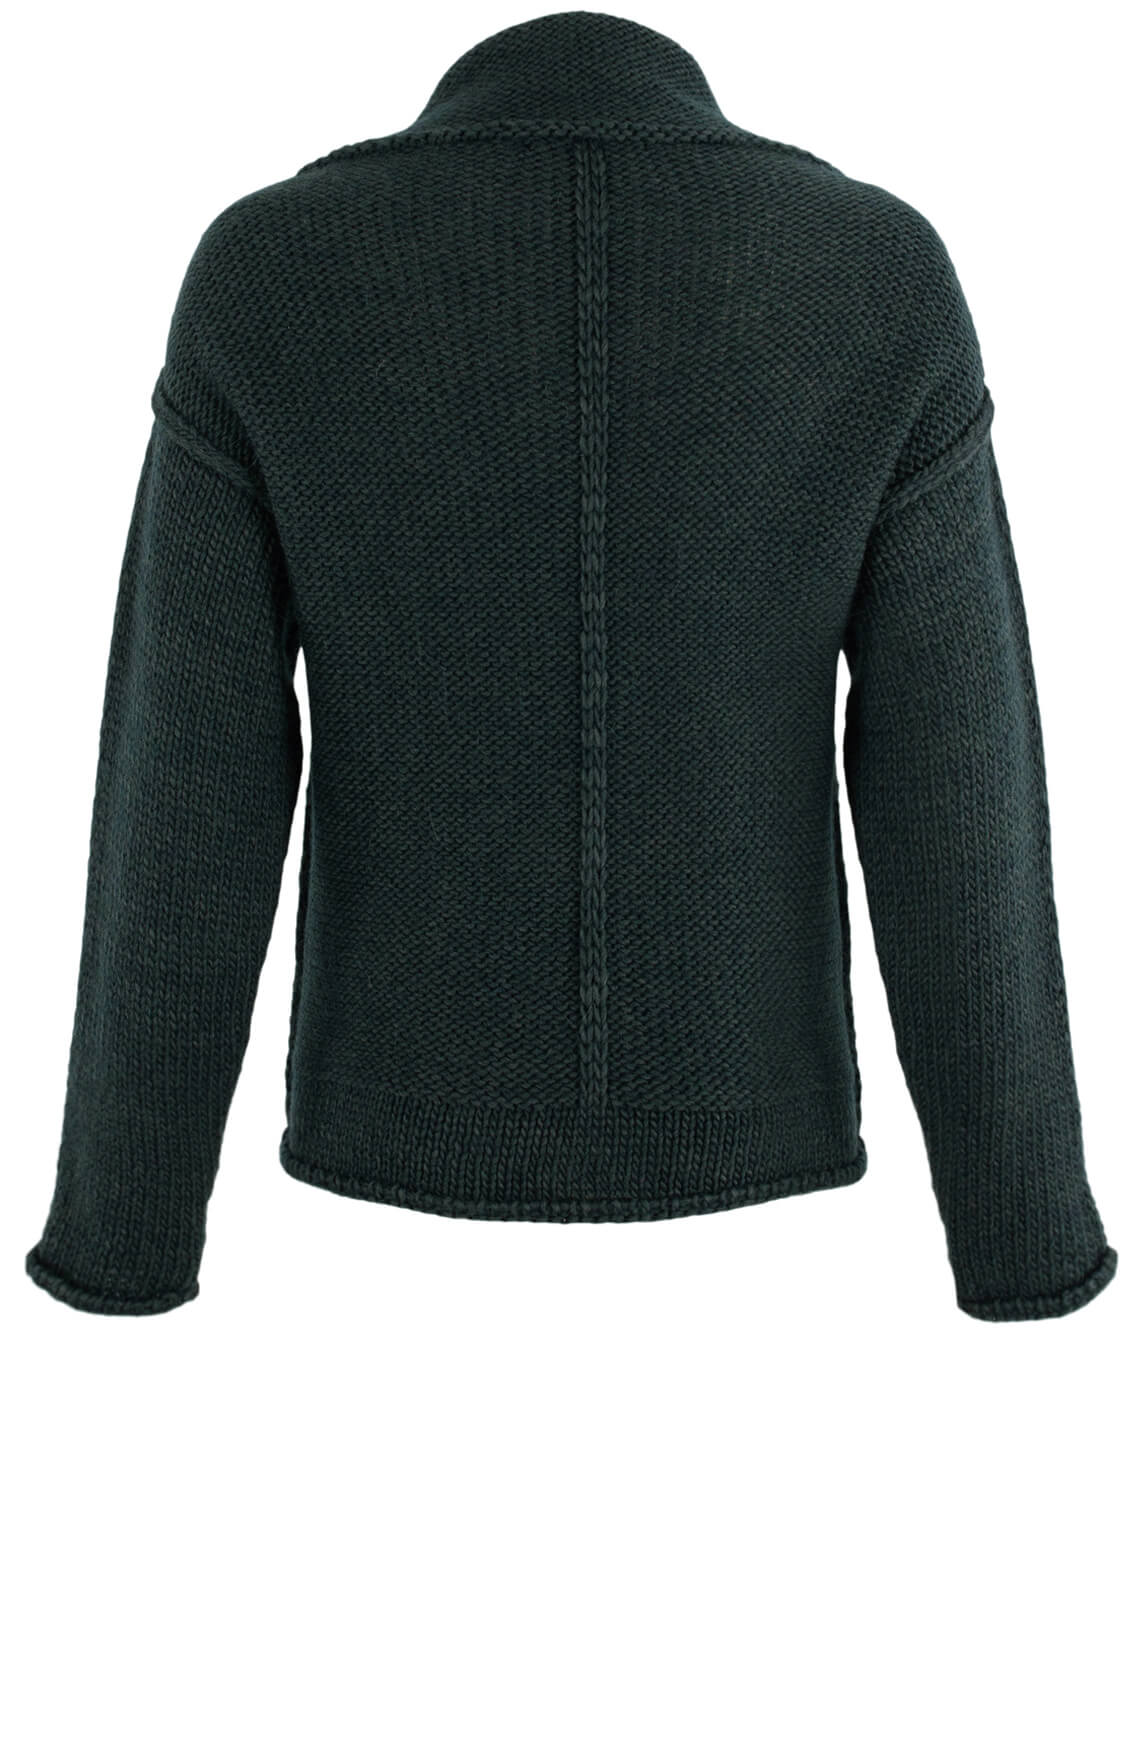 Moscow Dames Sweater Harielle Groen